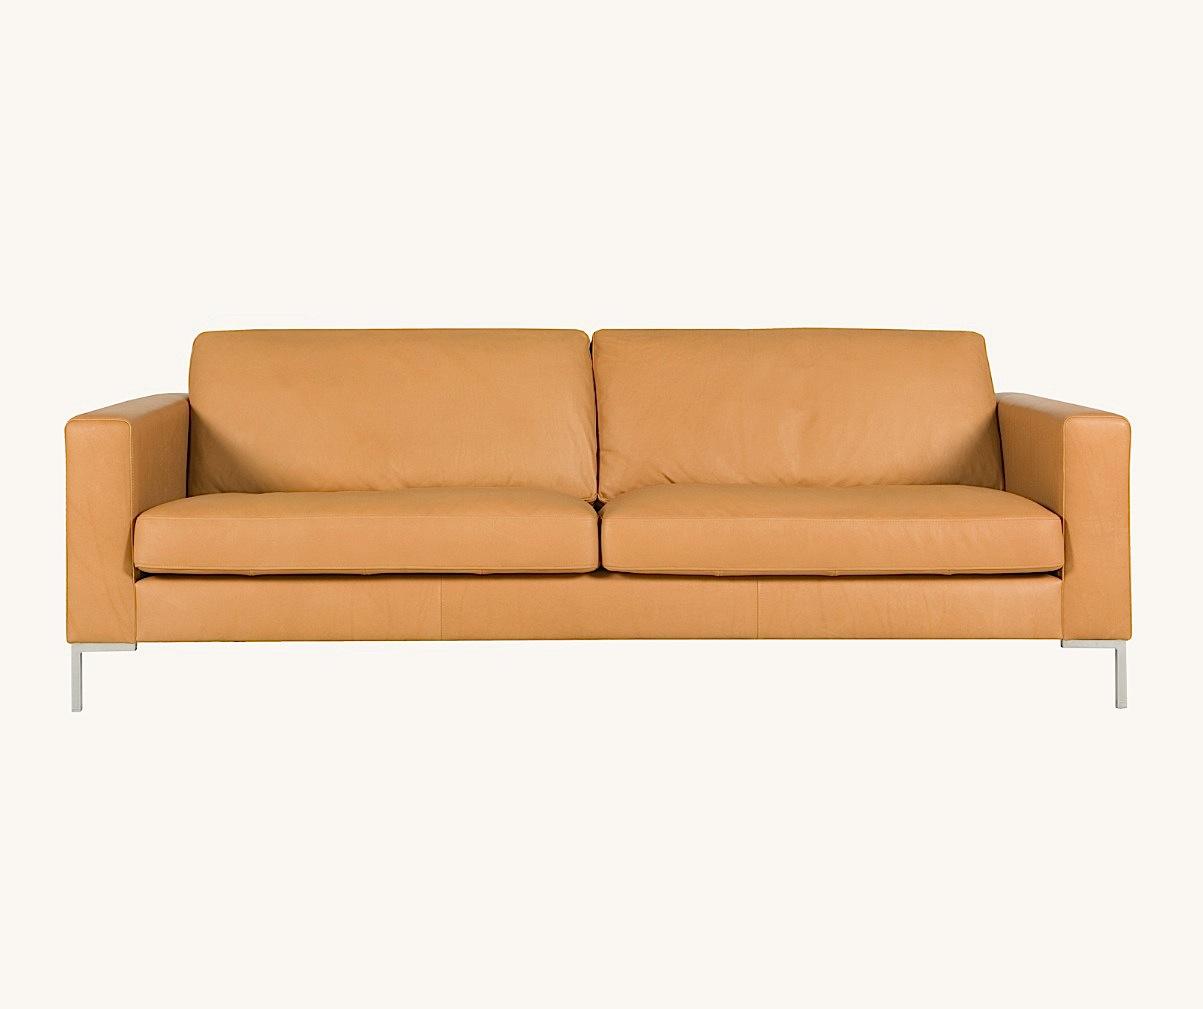 Meridian 2.5 Seater Sofa With Divan-30381